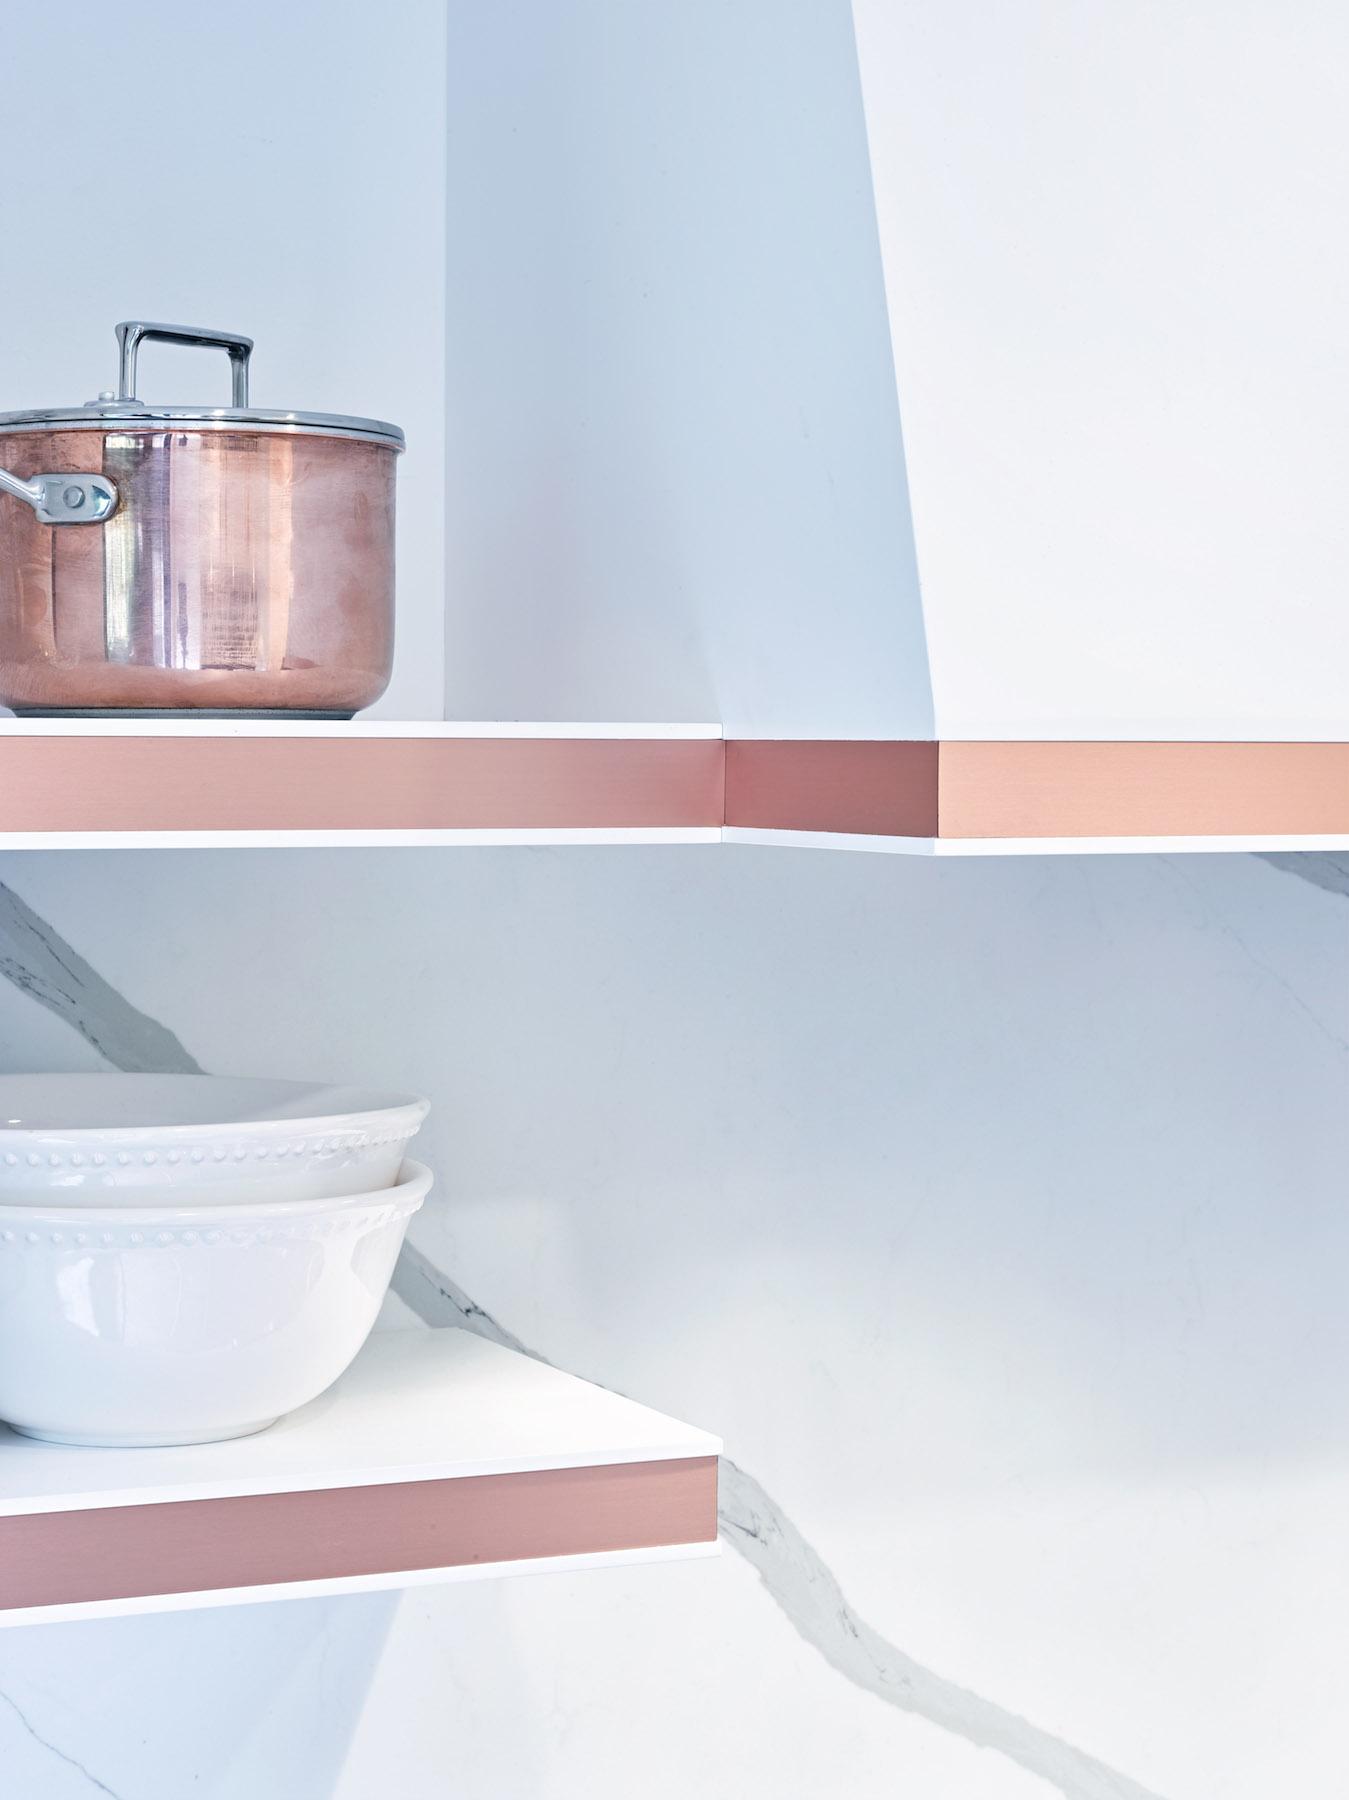 White Quartz Backsplash and Furniture Hood with Brass Detail